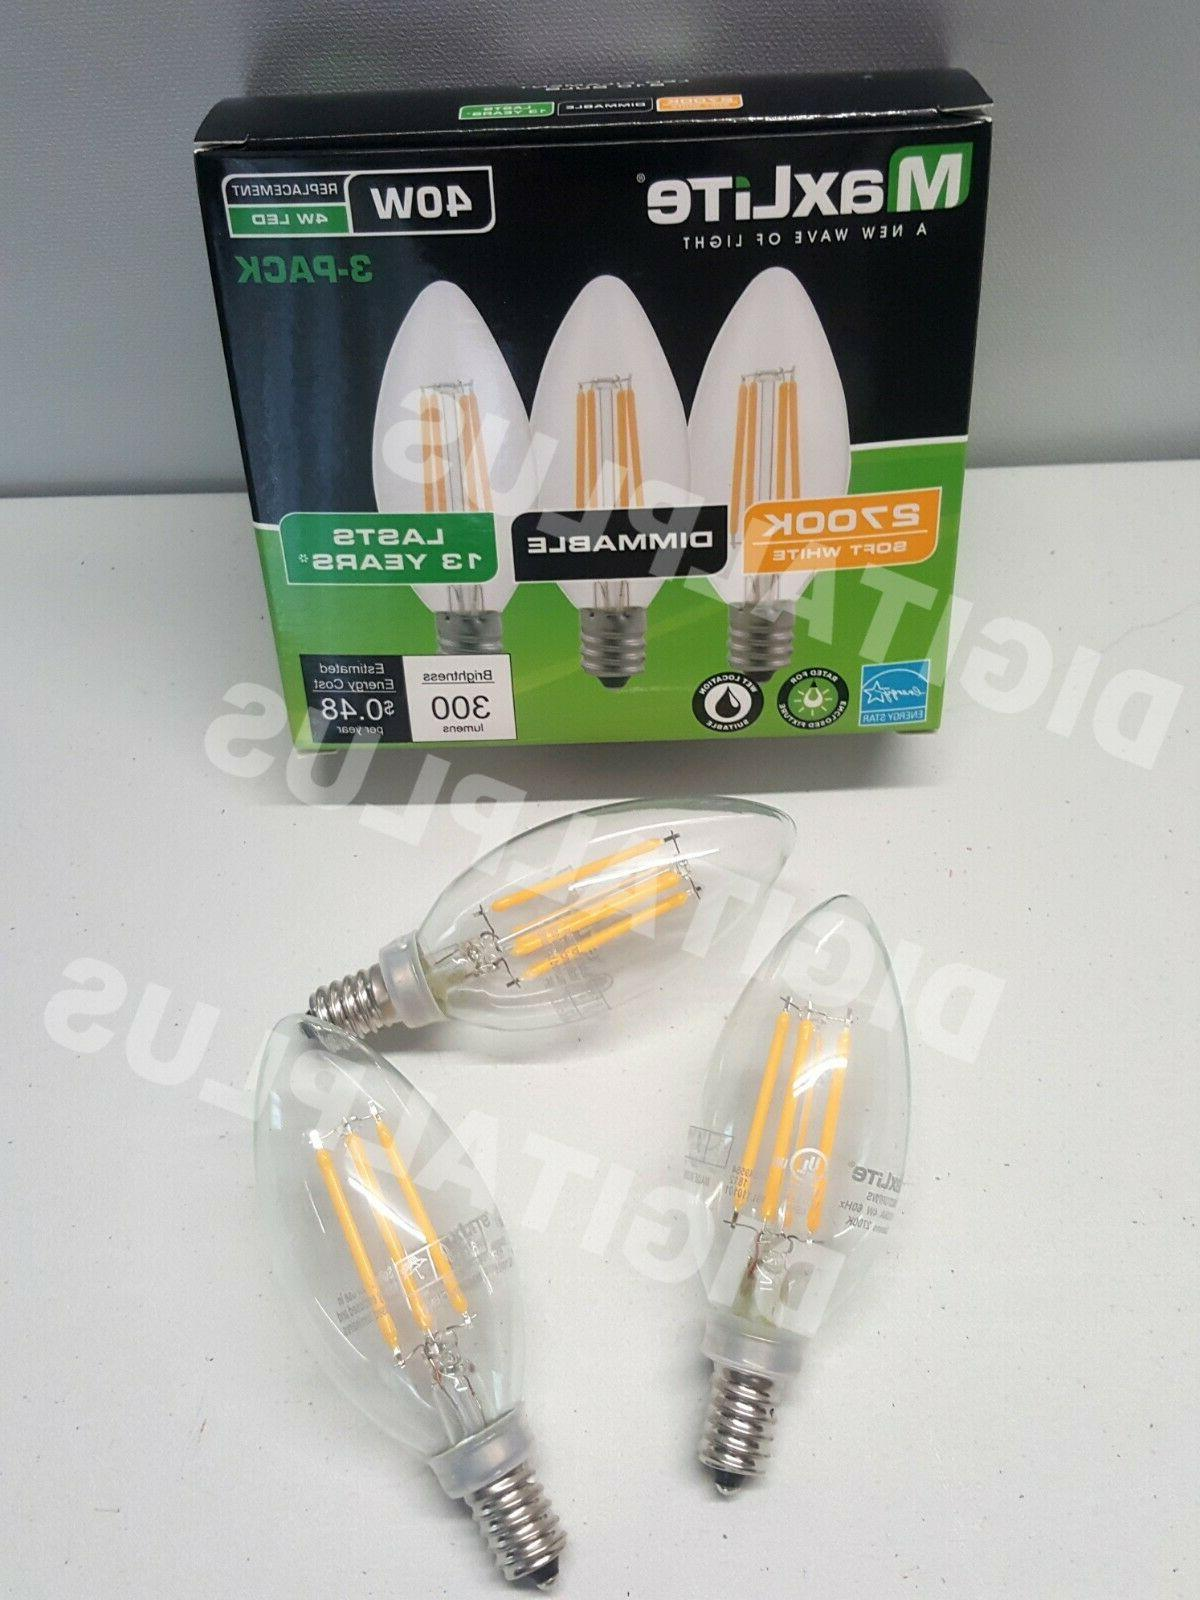 6 LED Light 2700k 40W 300L Candelabra Dimmable